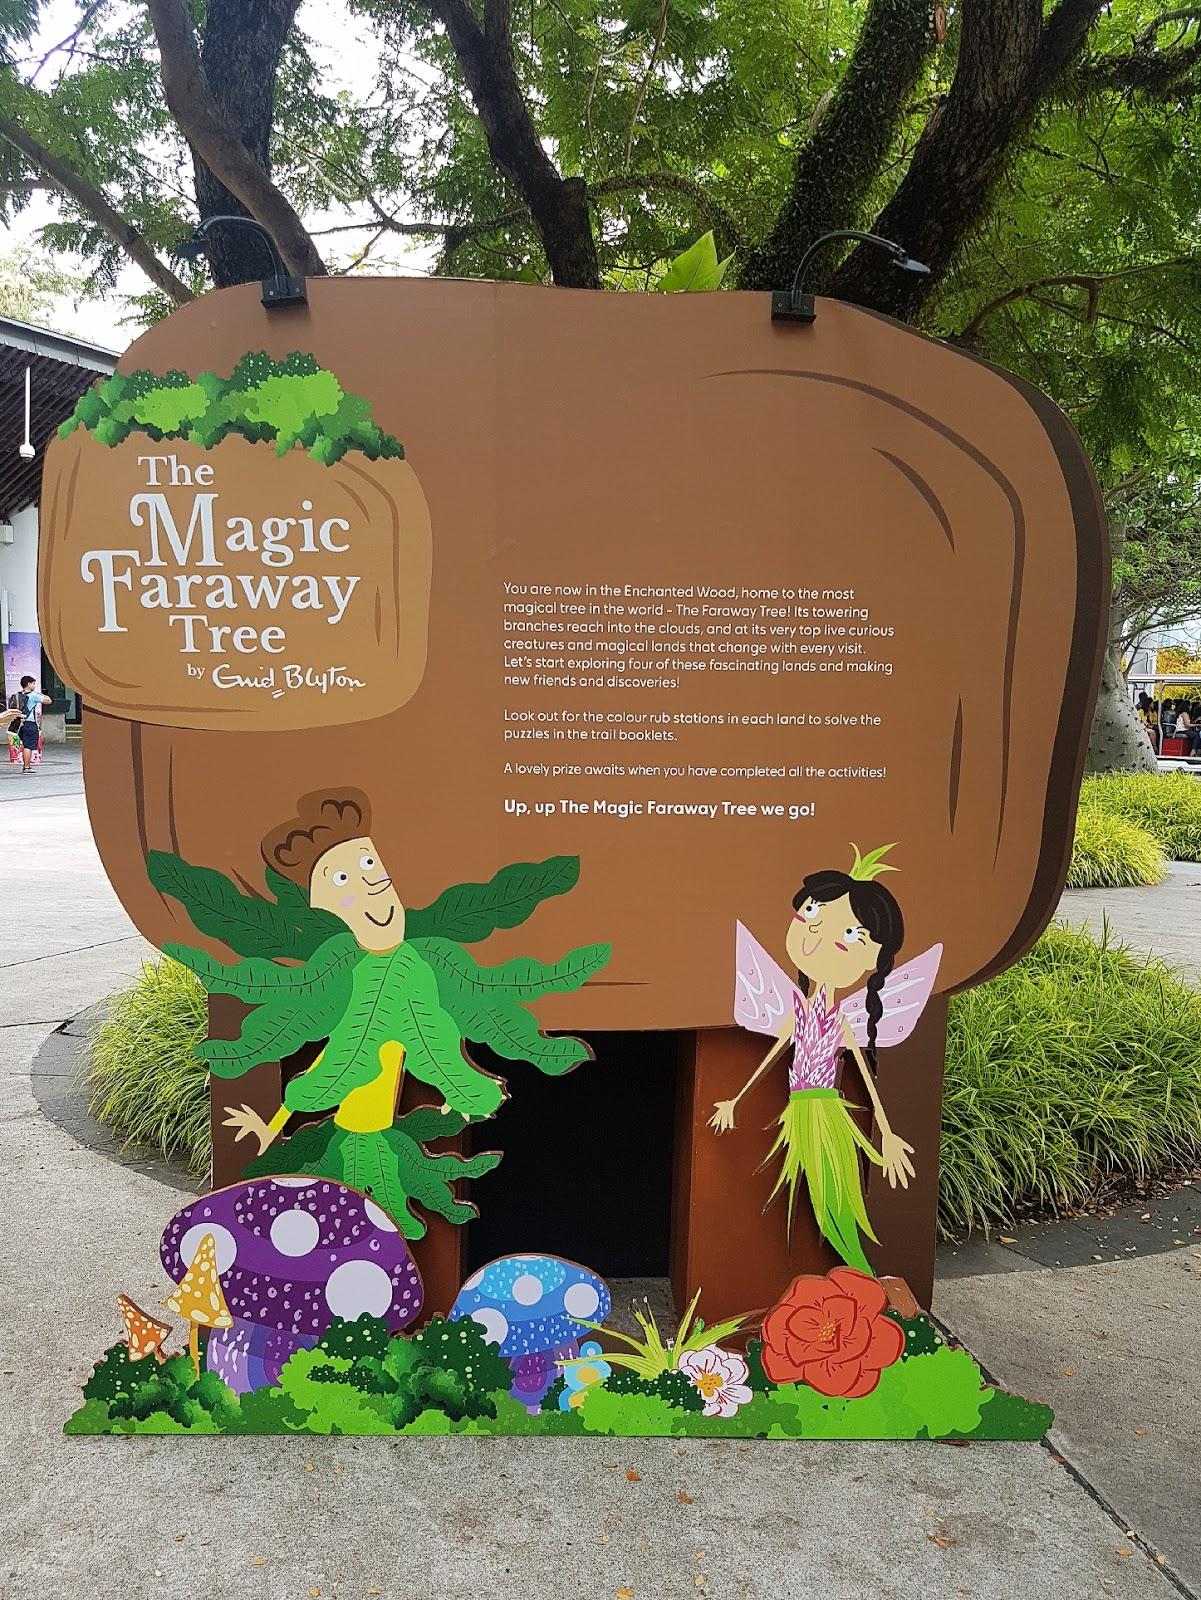 I promise I will go jog today: The Magic Faraway Tree @ Gardens by ...